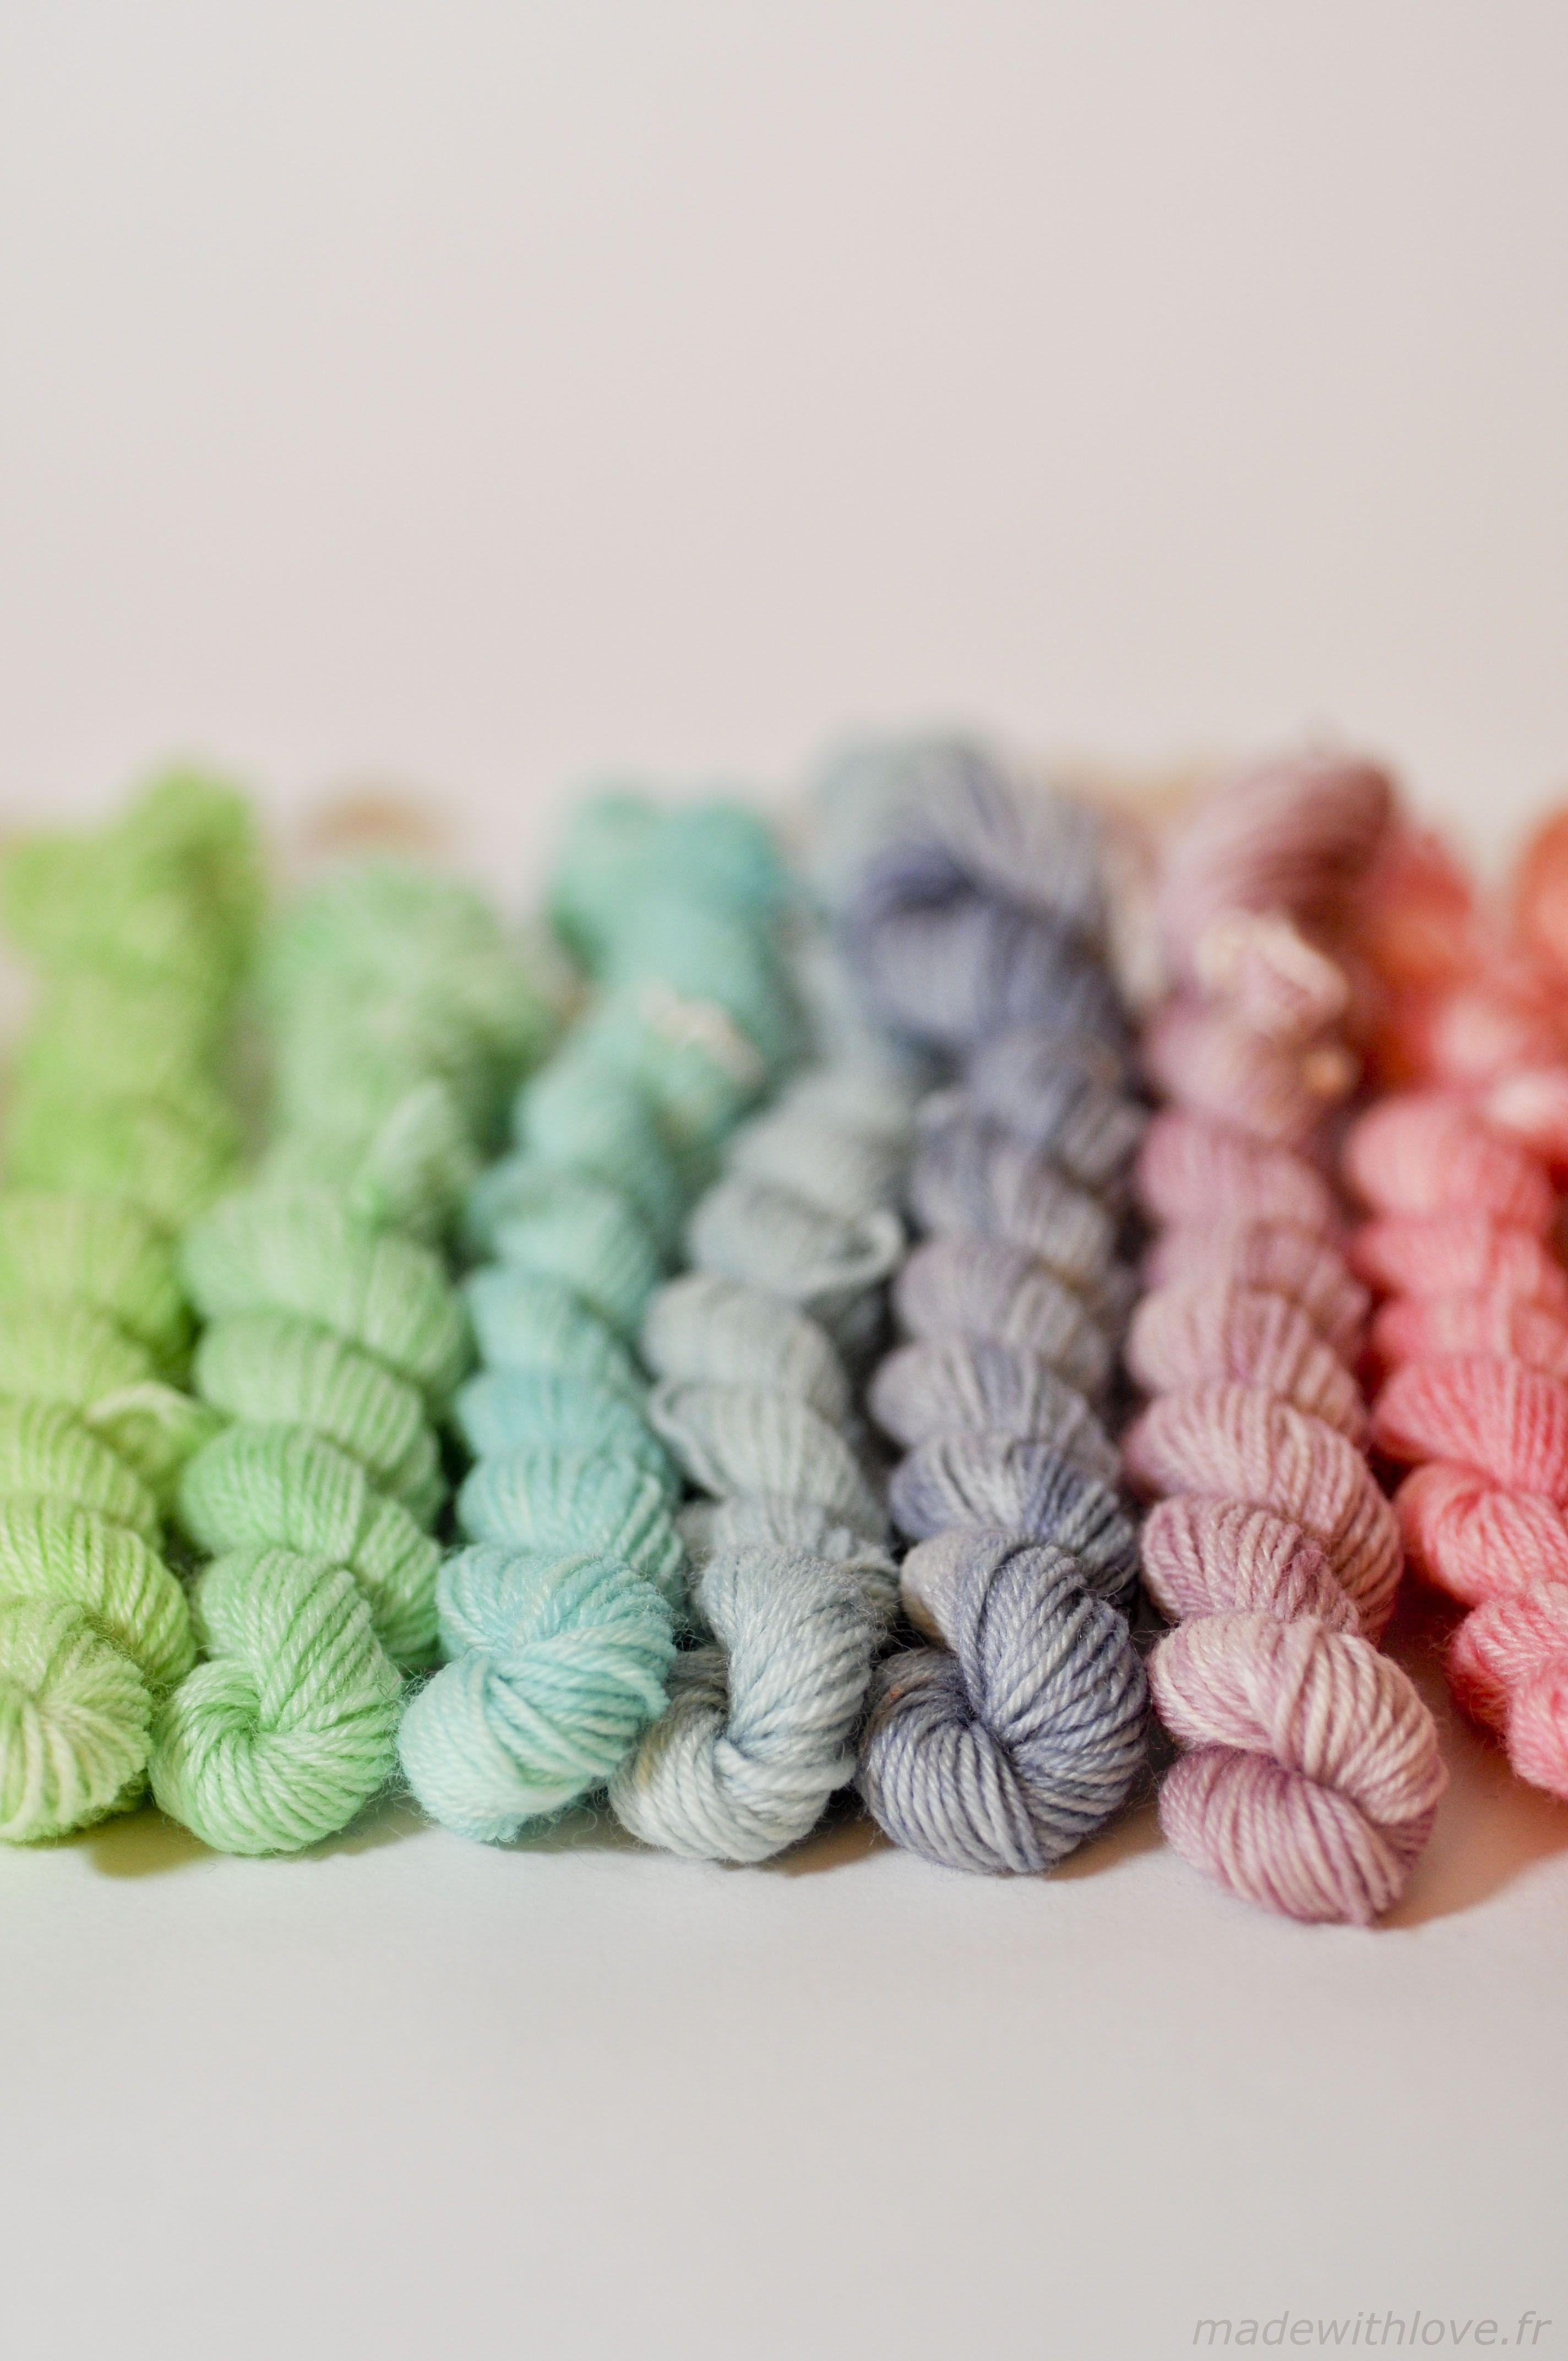 food coloring dyed yarn | Overflowing Inspiration | Crochet yarn ...